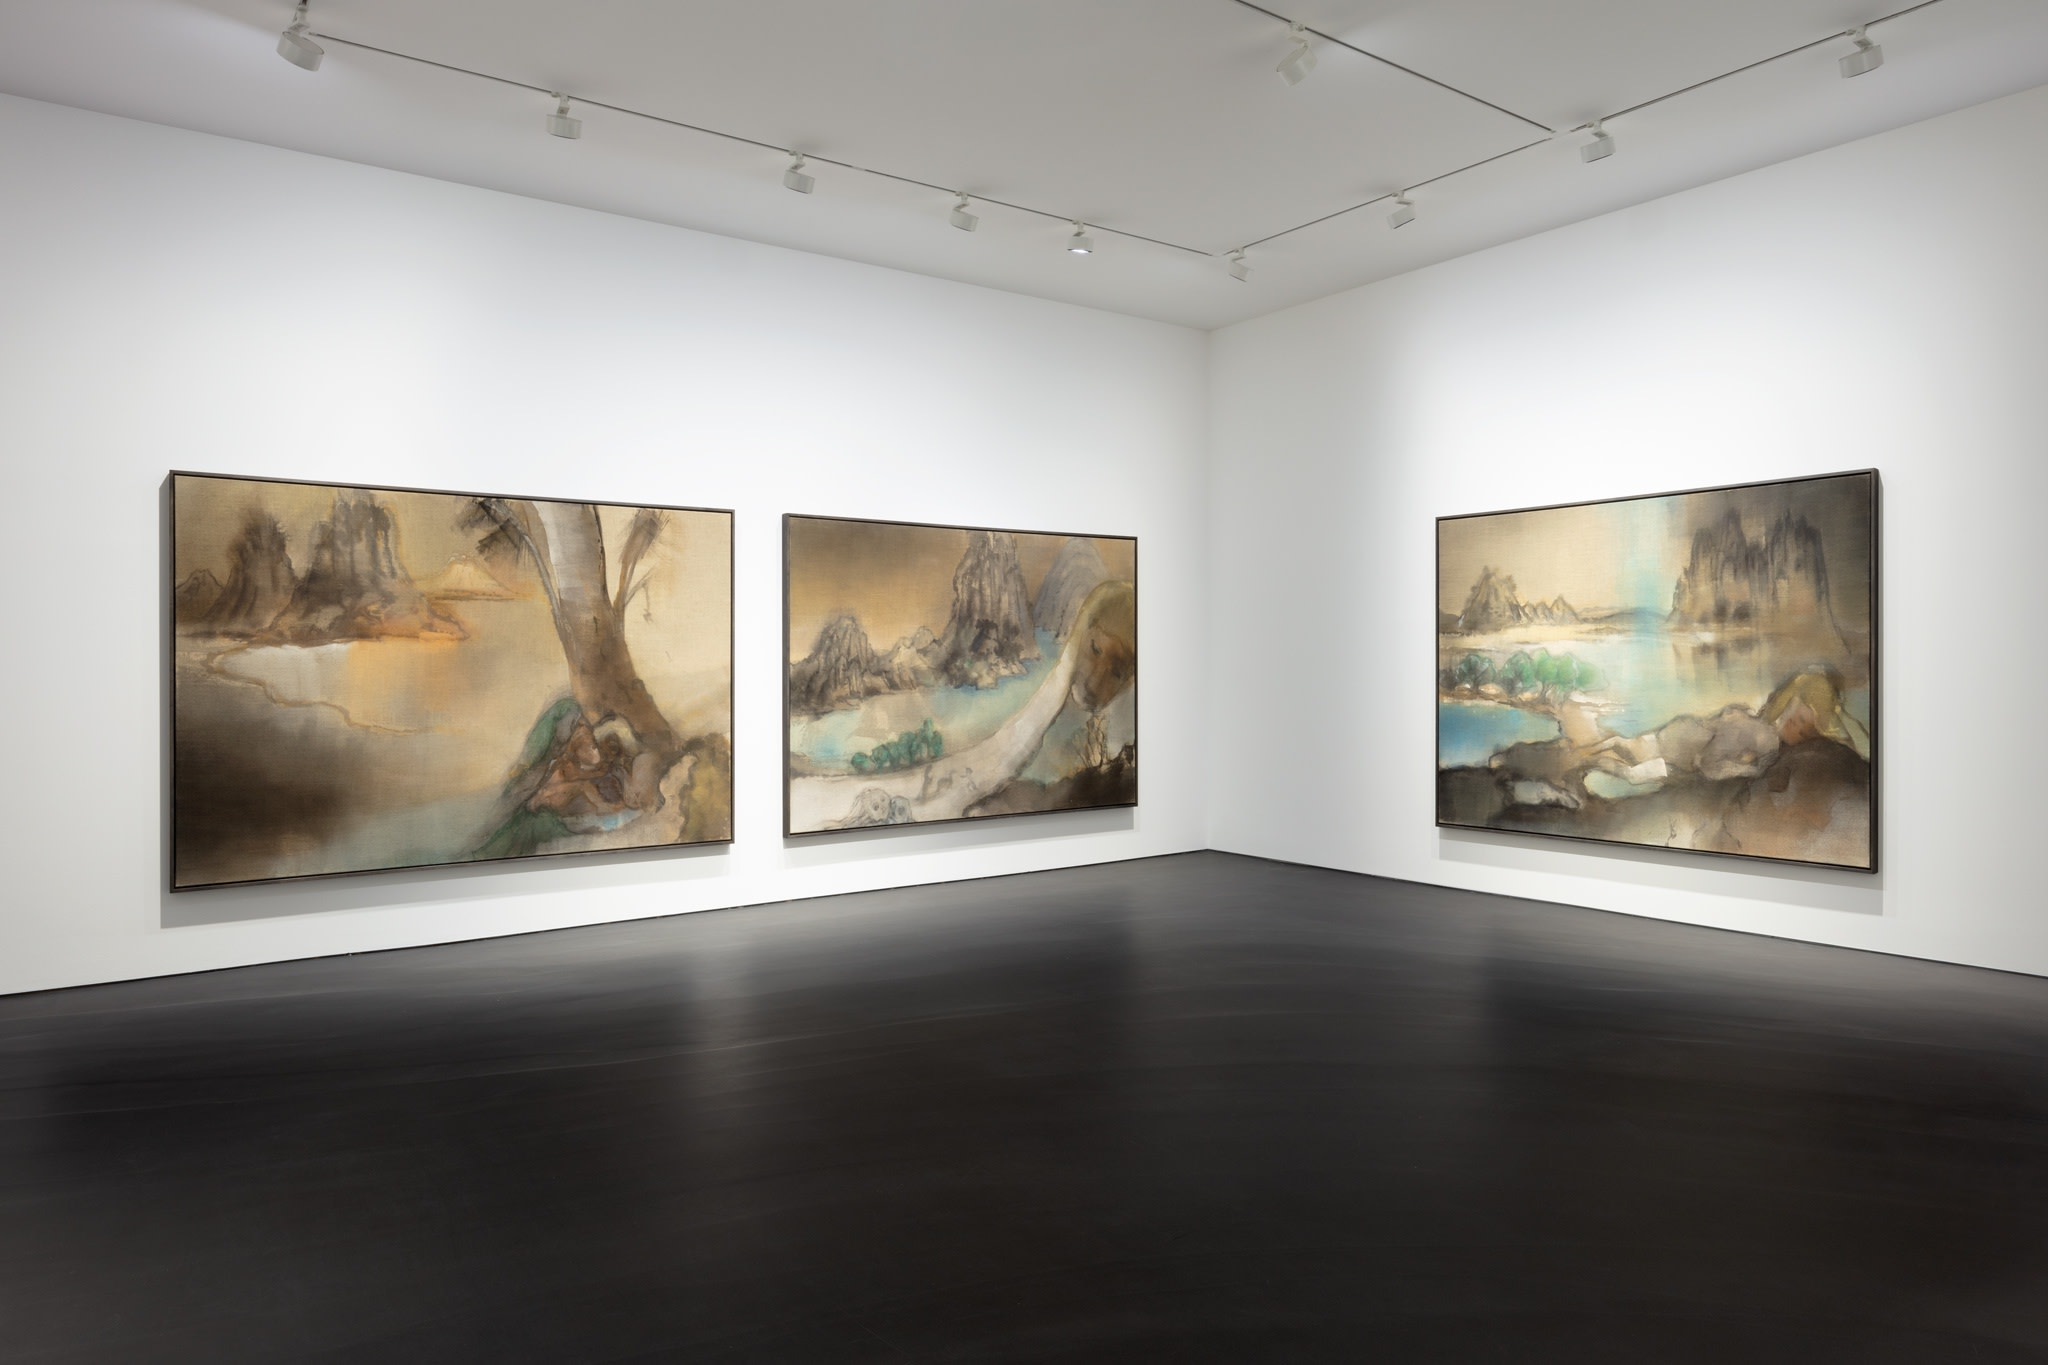 From left to right: Leiko Ikemura, Genesis, 2015, tempera on jute, 190 x 290 cm (74 3/4 x 114 1/8 in); Tokaido, 2015, tempera on jute, 190 x 290 cm (74 3/4 x 114 1/8 in); Tokaido, 2015, tempera on jute, 190 x 290 cm (74 3/4 x 114 1/8 in). Photo © Andrea Rossetti